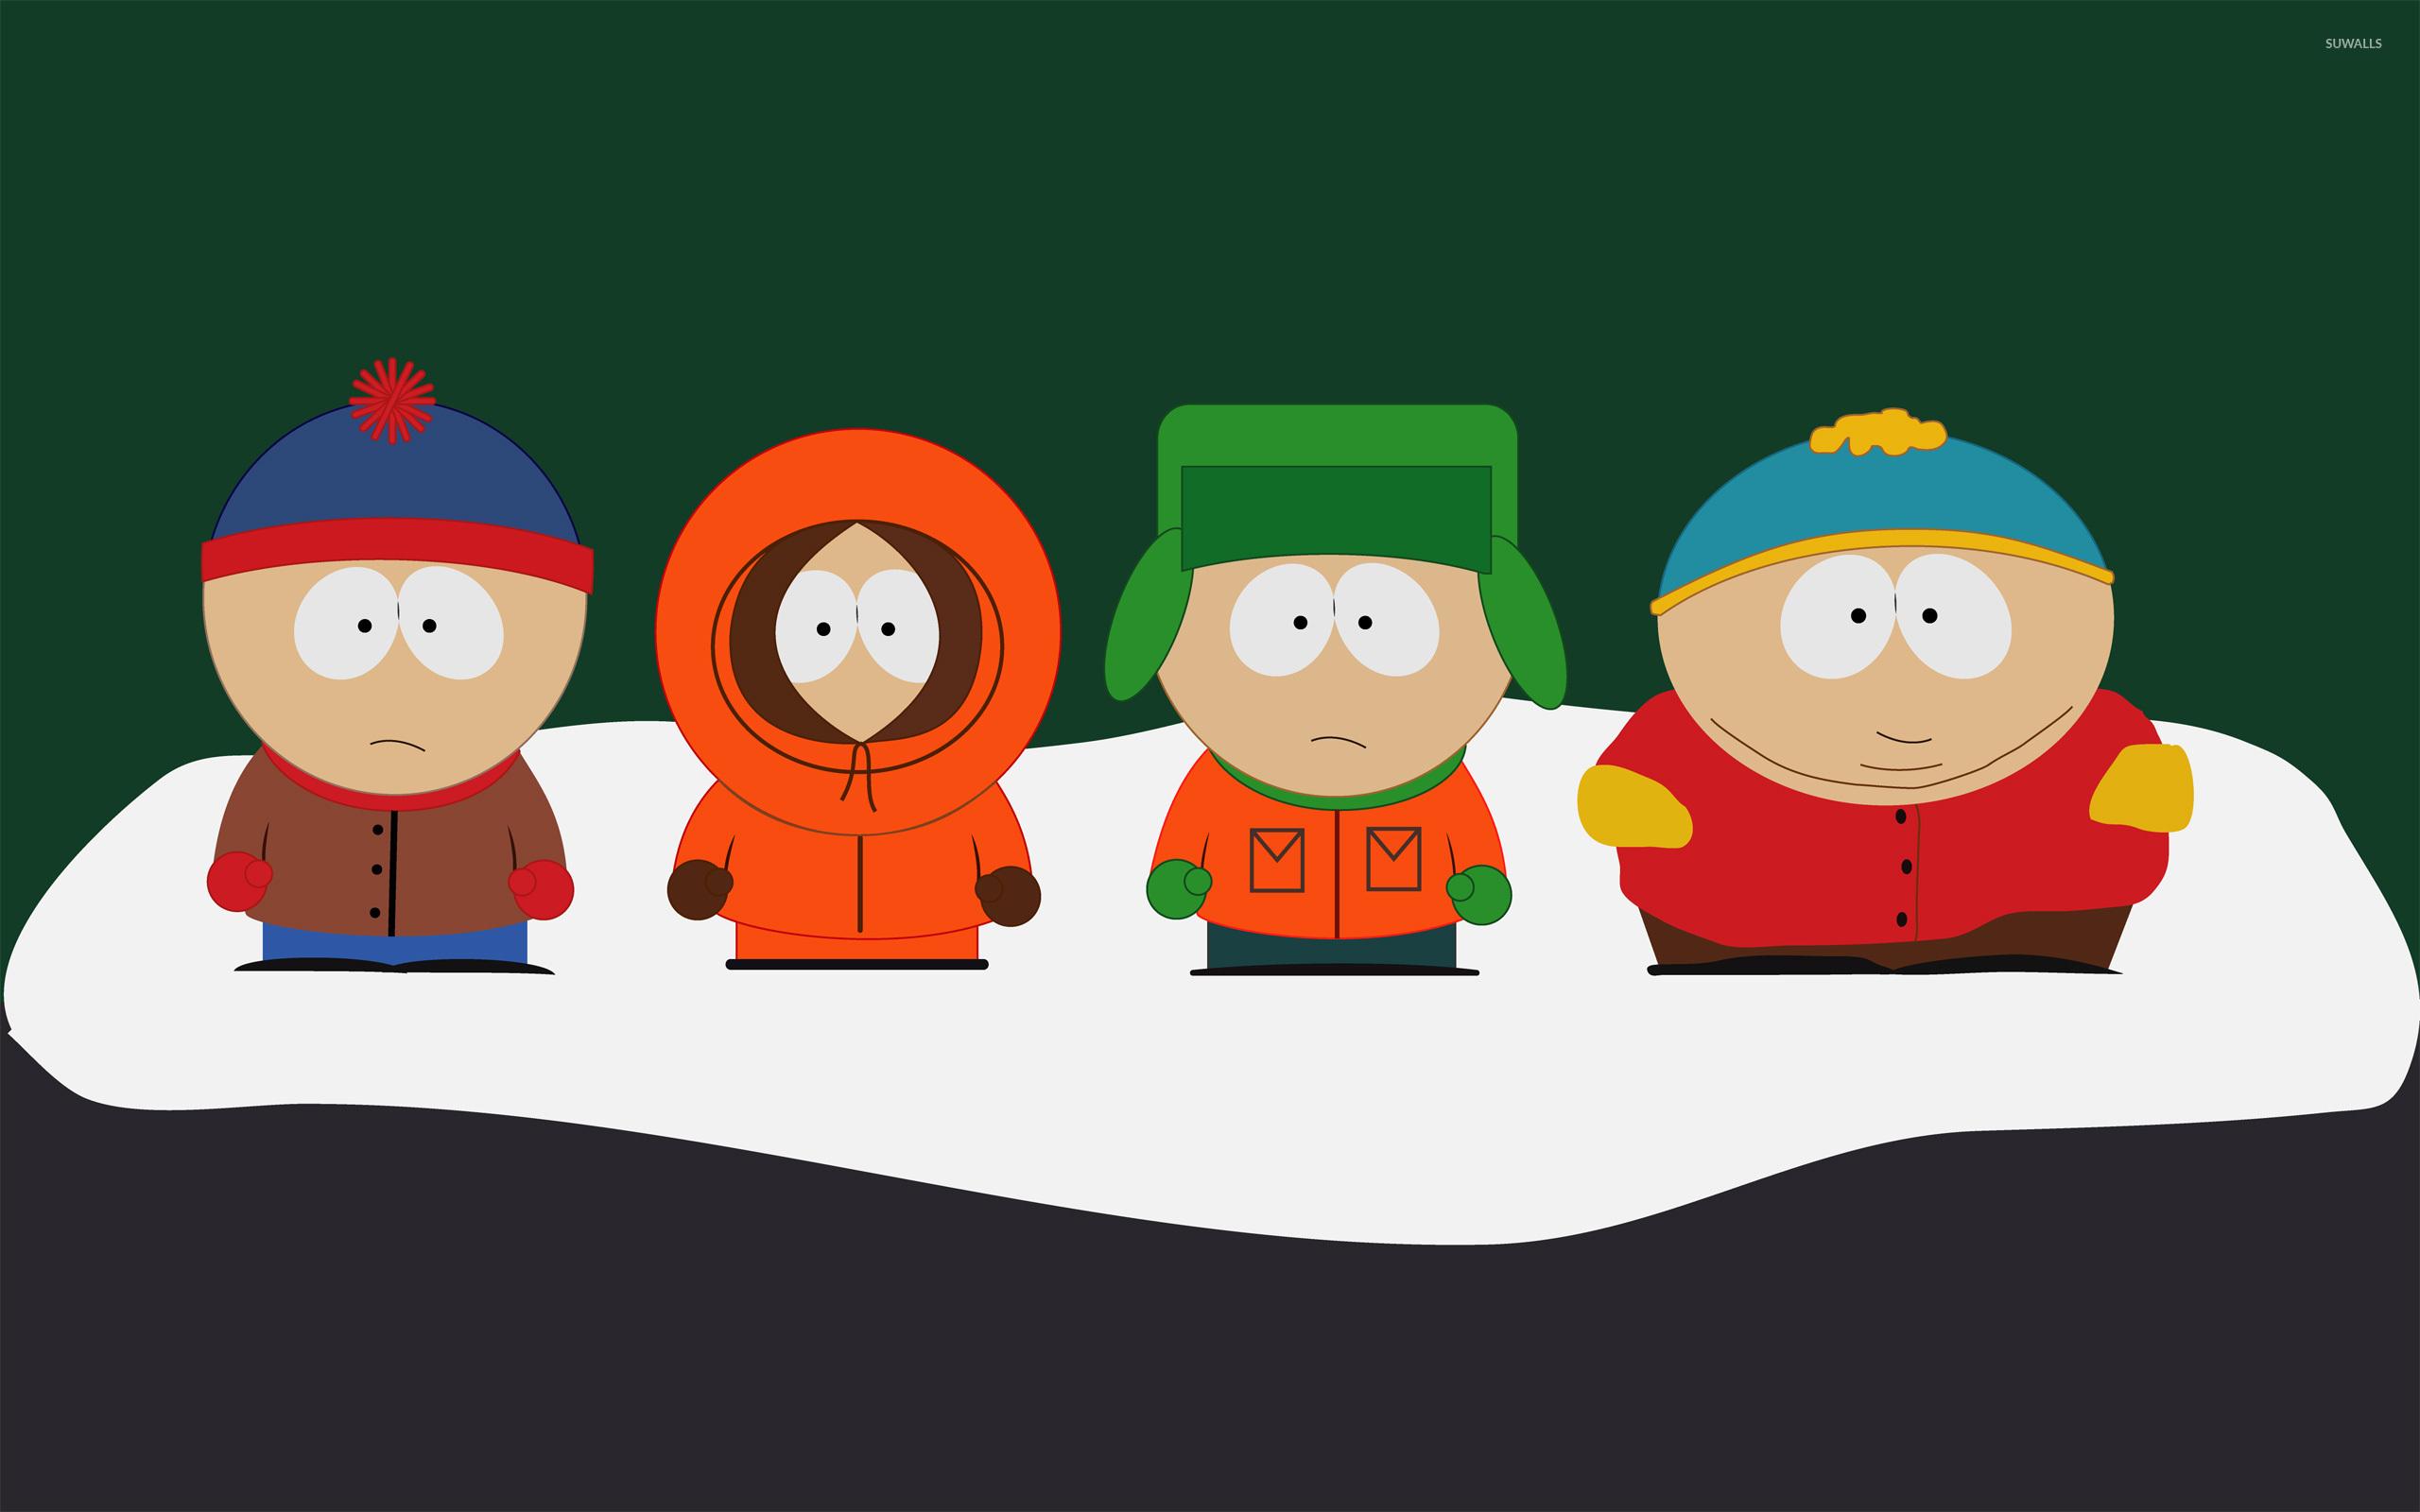 South Park 2 Wallpaper Cartoon Wallpapers 5377